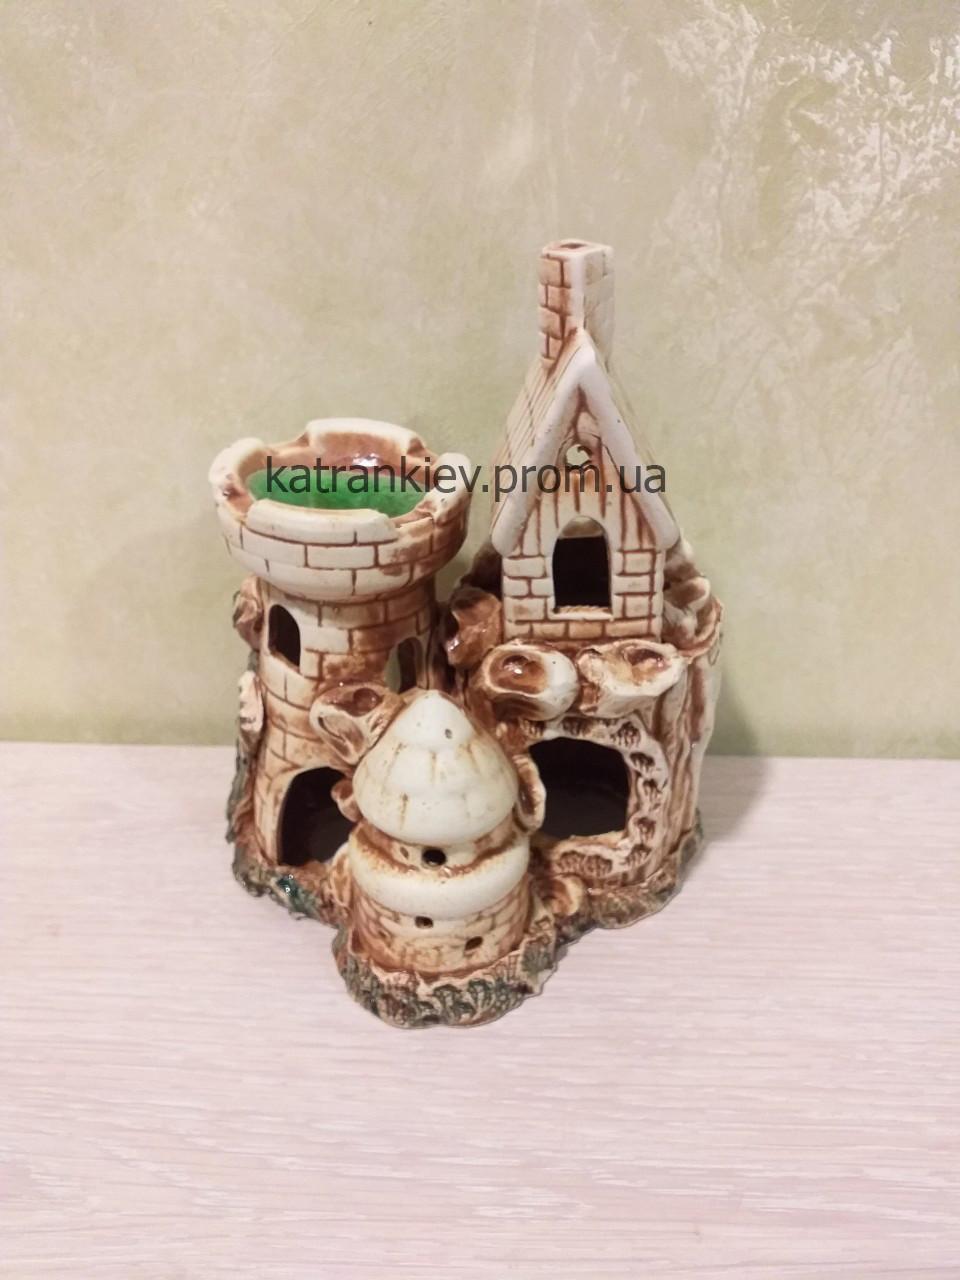 Декорация в аквариум домик, замок, башня декор для аквариума с 428